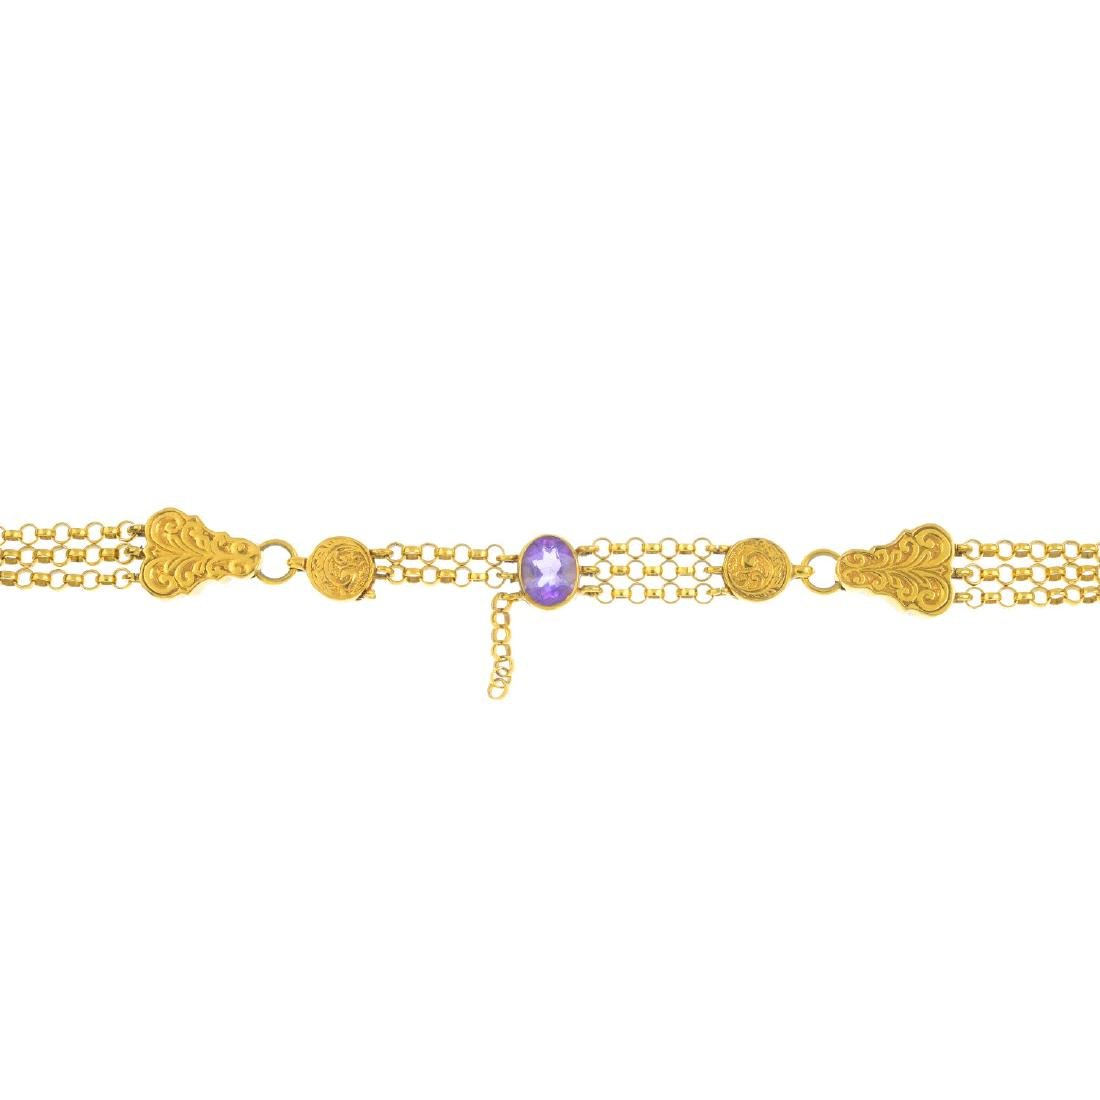 A 9ct gold amethyst bracelet. The oval-shape amethyst,